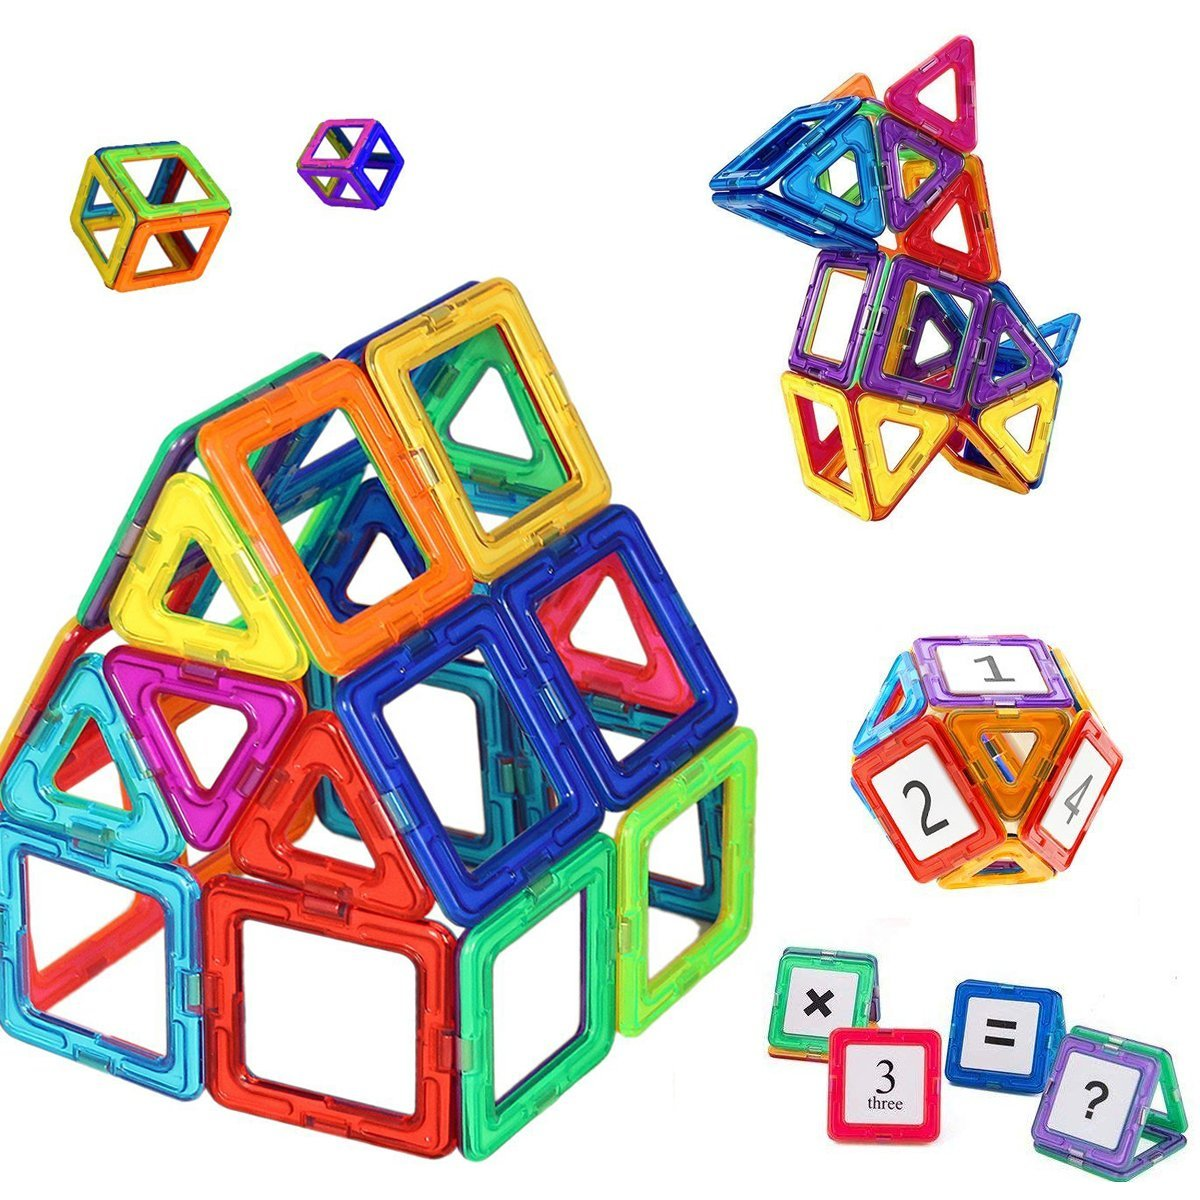 Mini Butterballe 56 Pcs Magnetic Building Blocks Tile Set, STEM Educational Learninig Toys for Kids, Magnet Stacking Blocks Preschool Construction Kits for Toddler